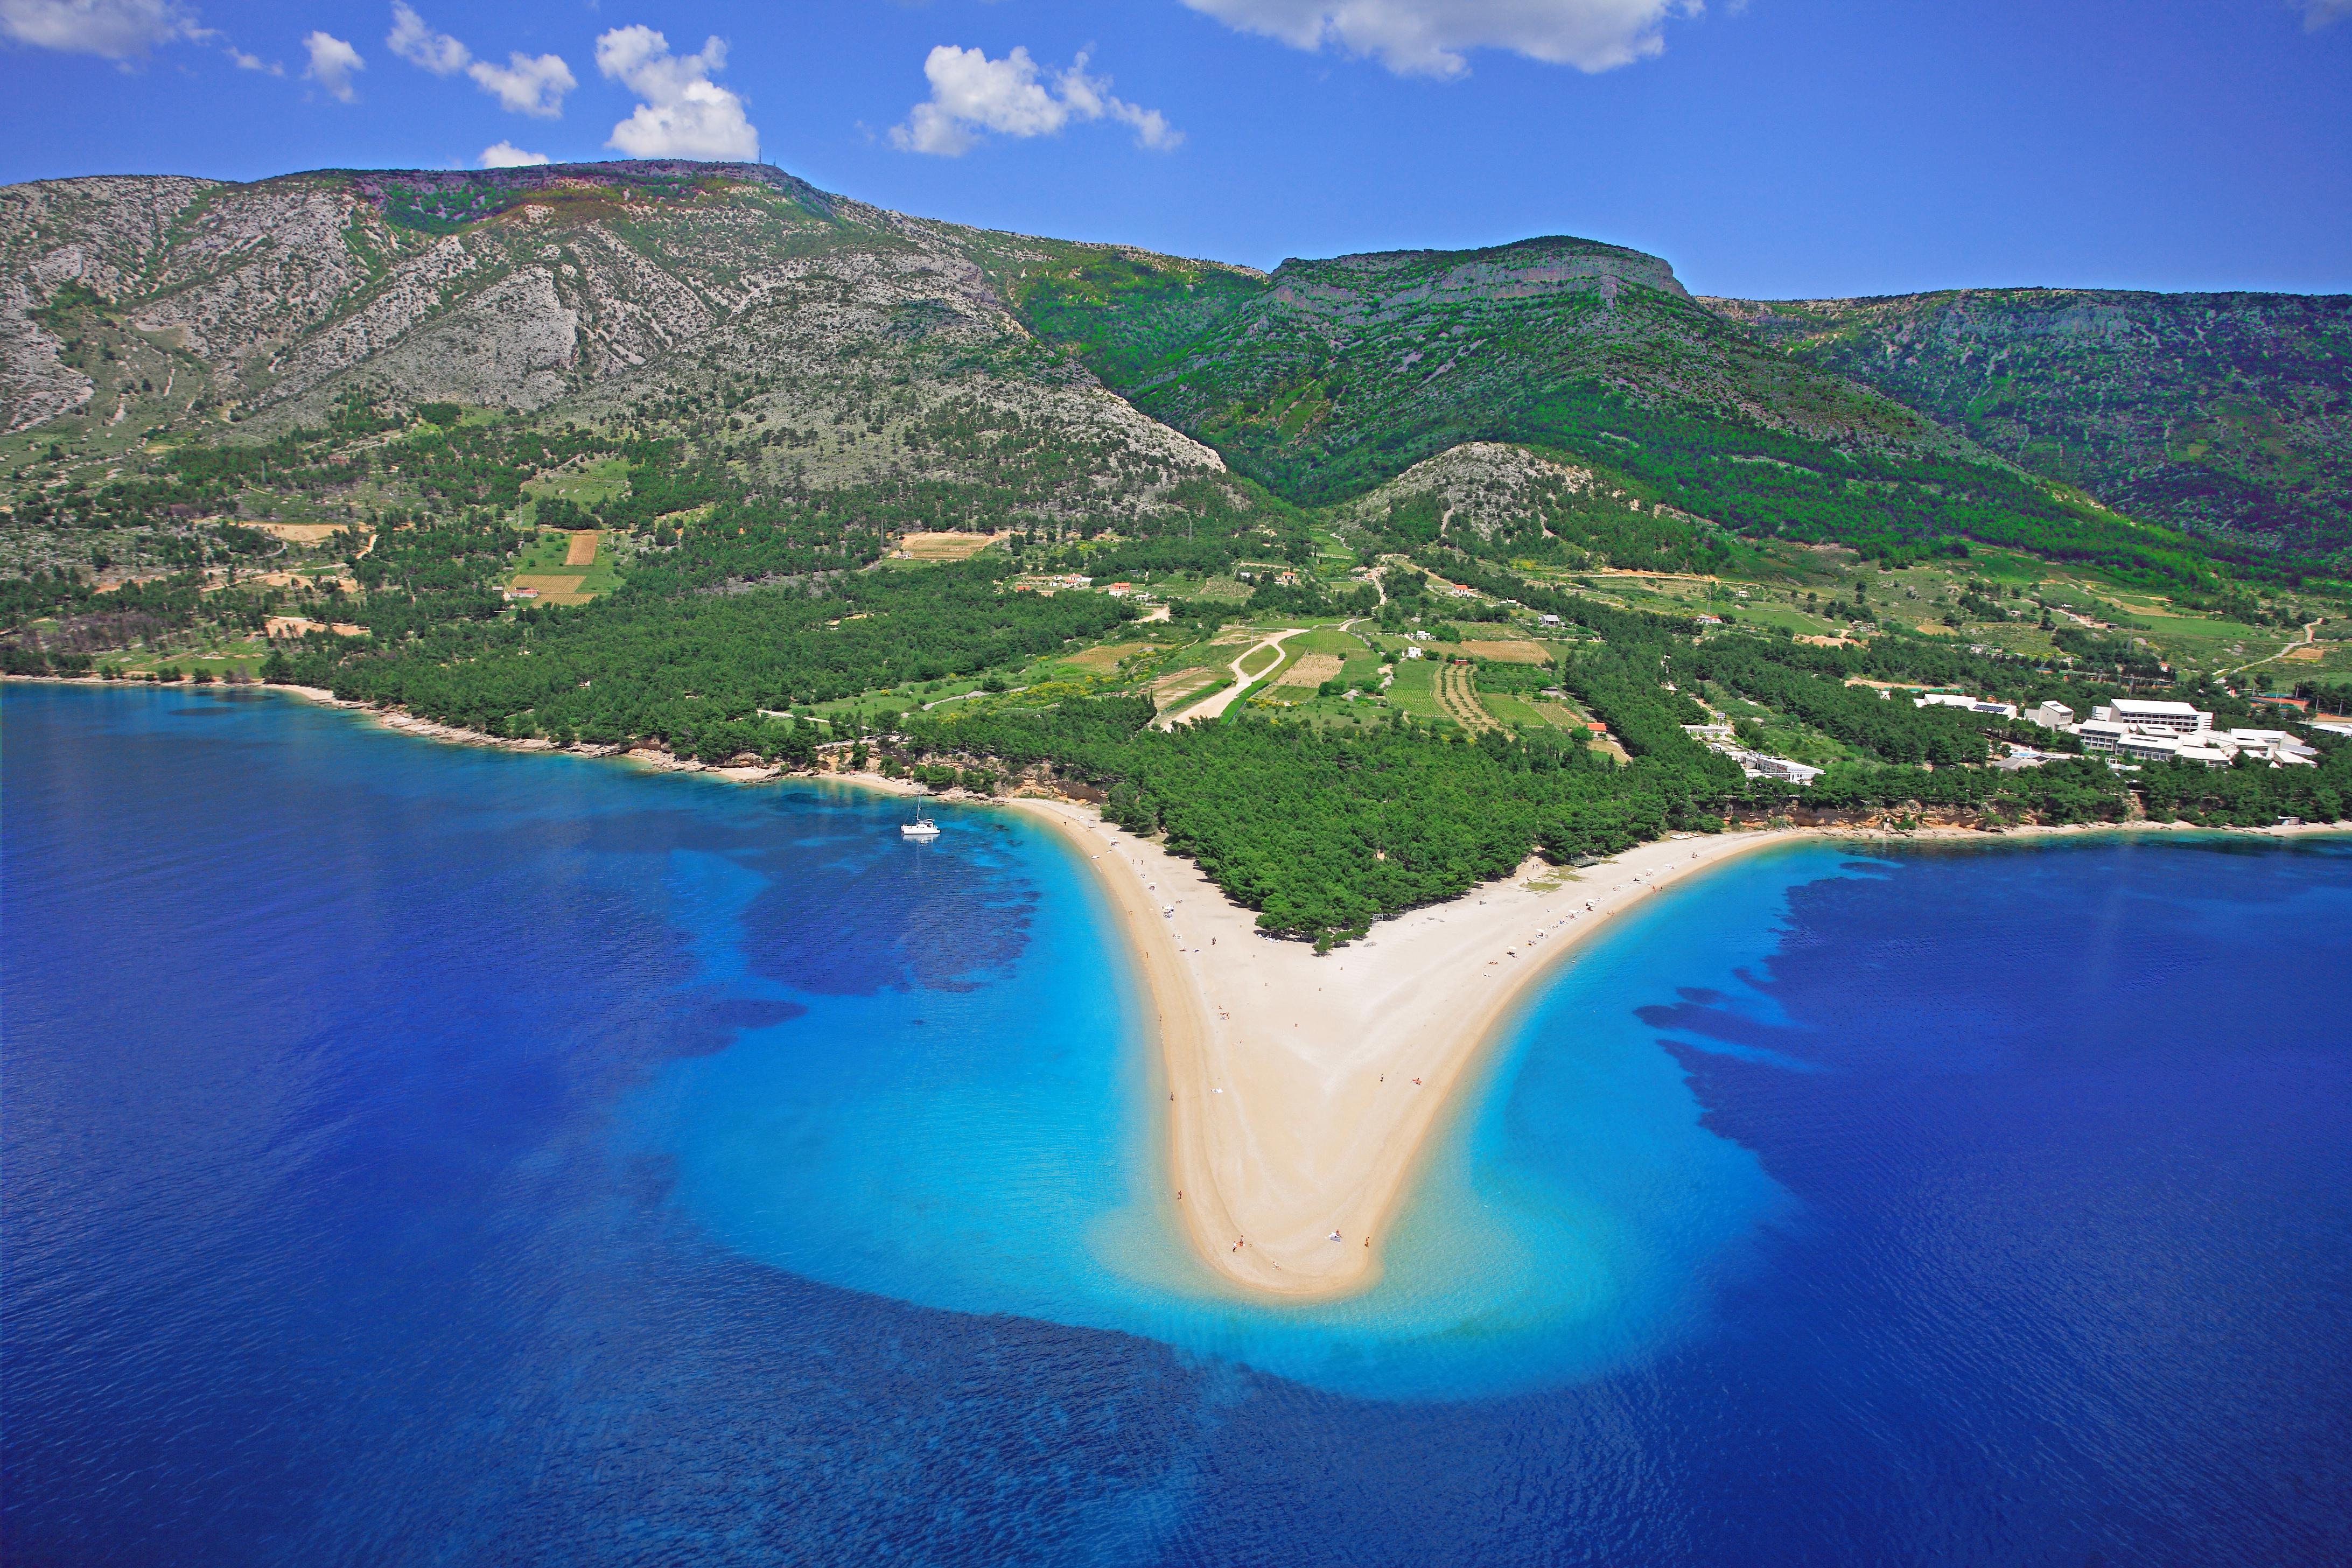 вам пляж золотой рог в хорватии фото бульвар москве